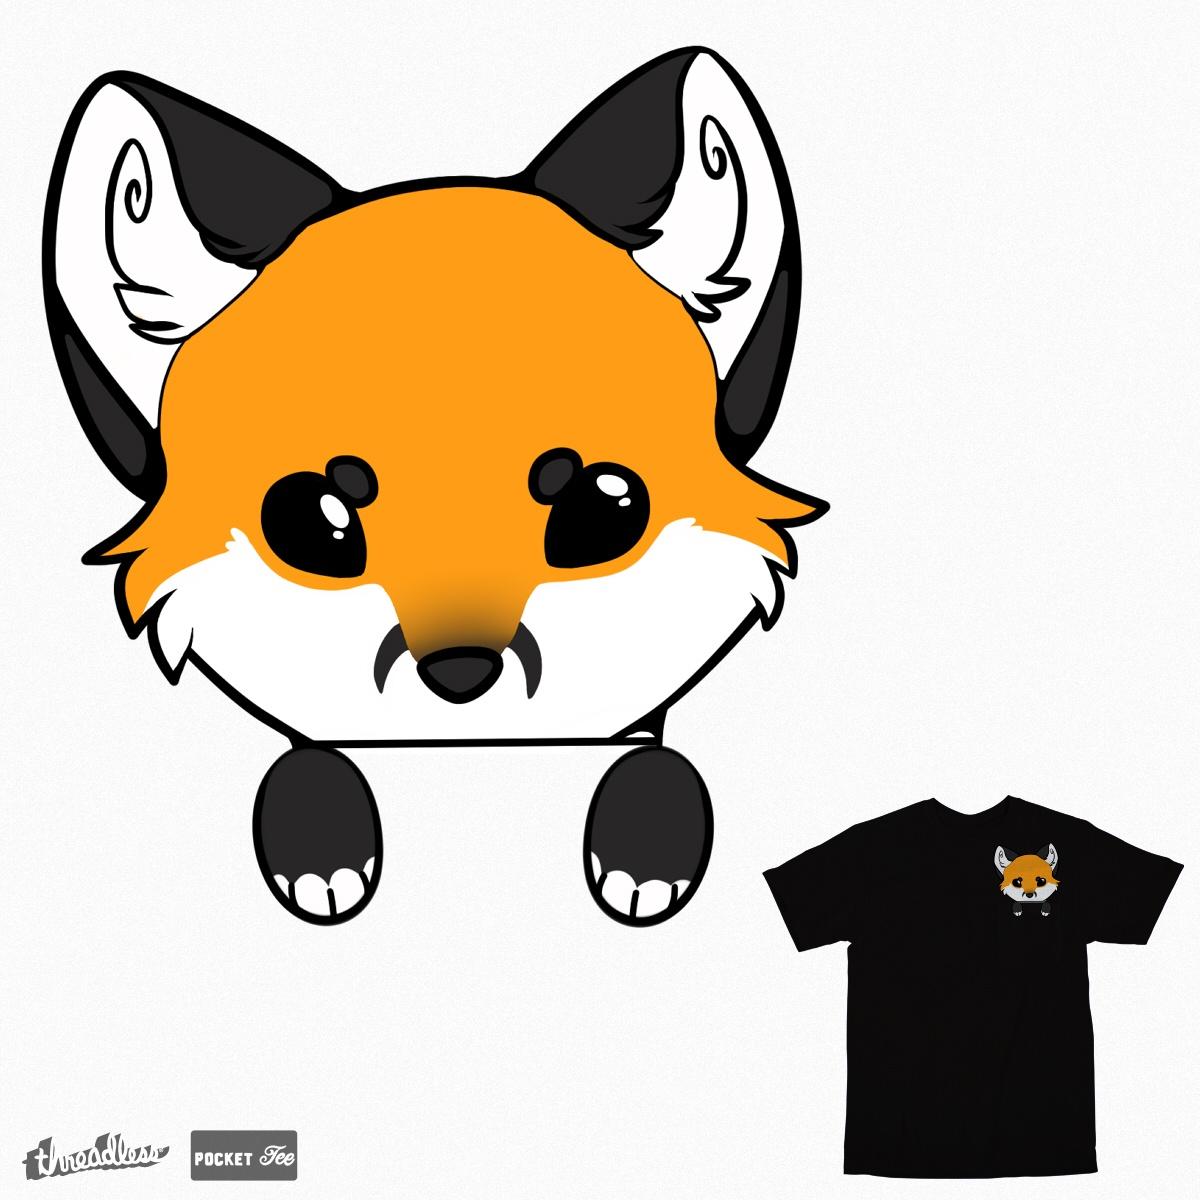 Pocket Fox by KyokoCat on Threadless